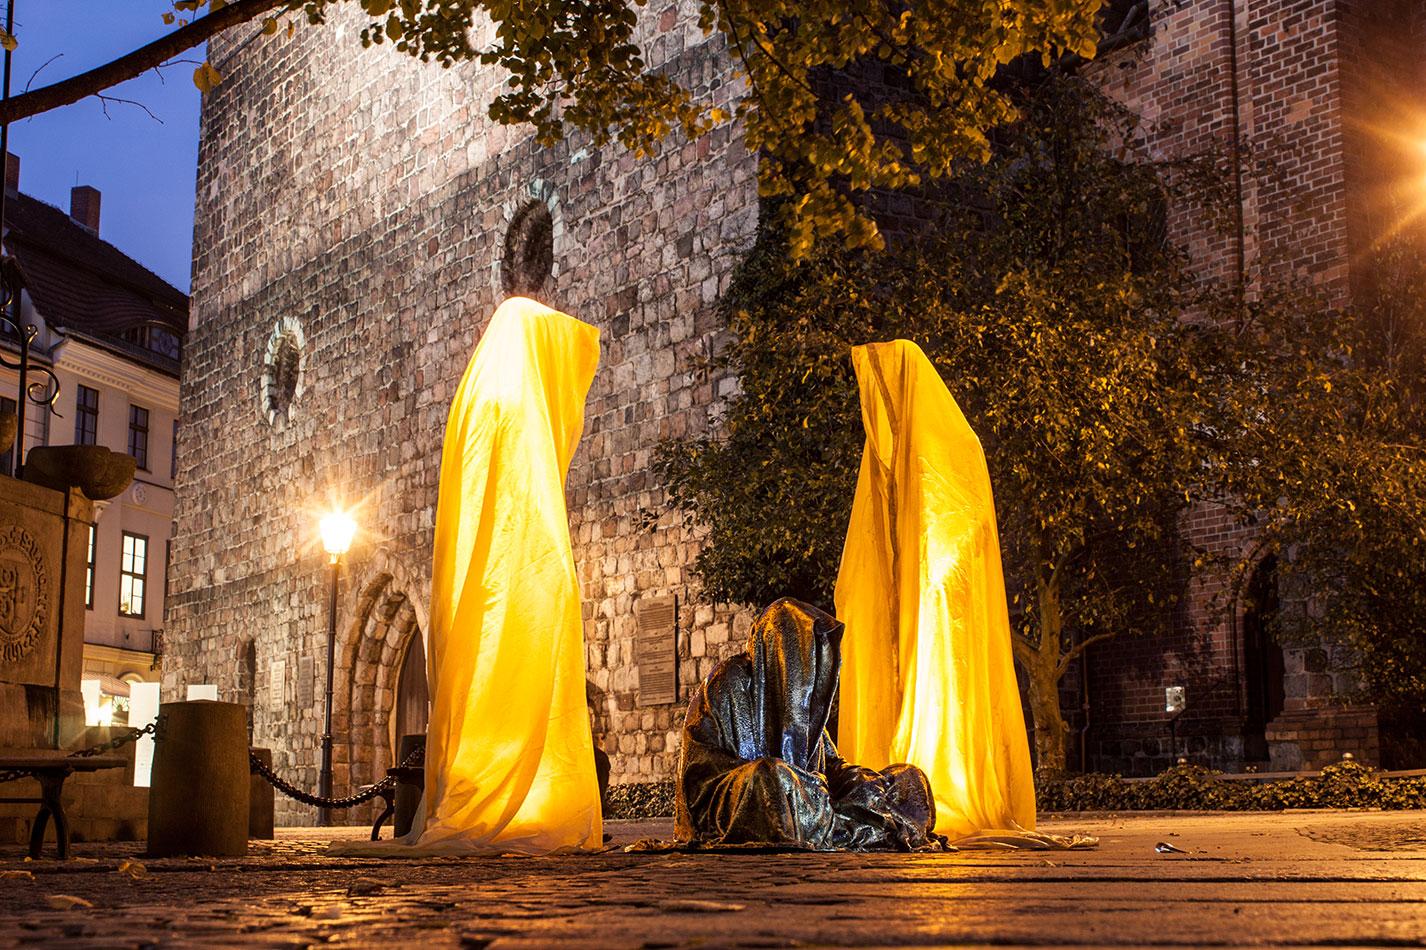 festival-of-lights-berlin-light-art-festival-contemporary-fine-art-design-show-guardiansof-time-manfred-kili-kielnhofer-sculpture-3708